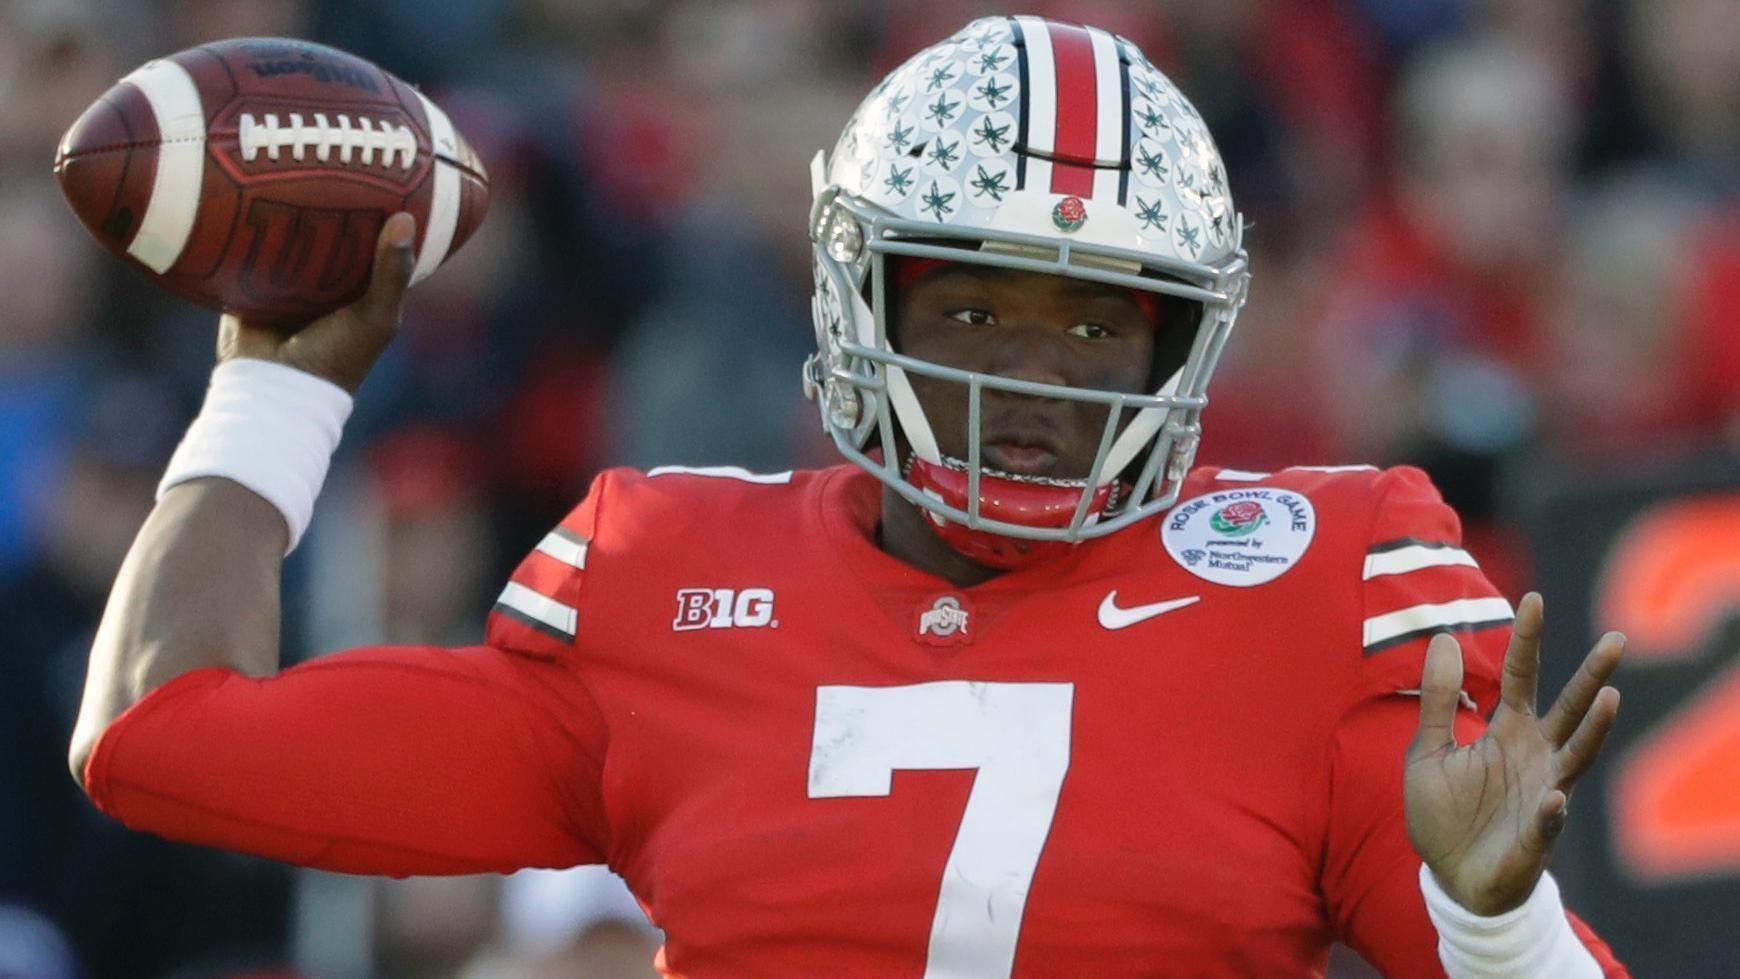 NFL draft profile: Dwayne Haskins